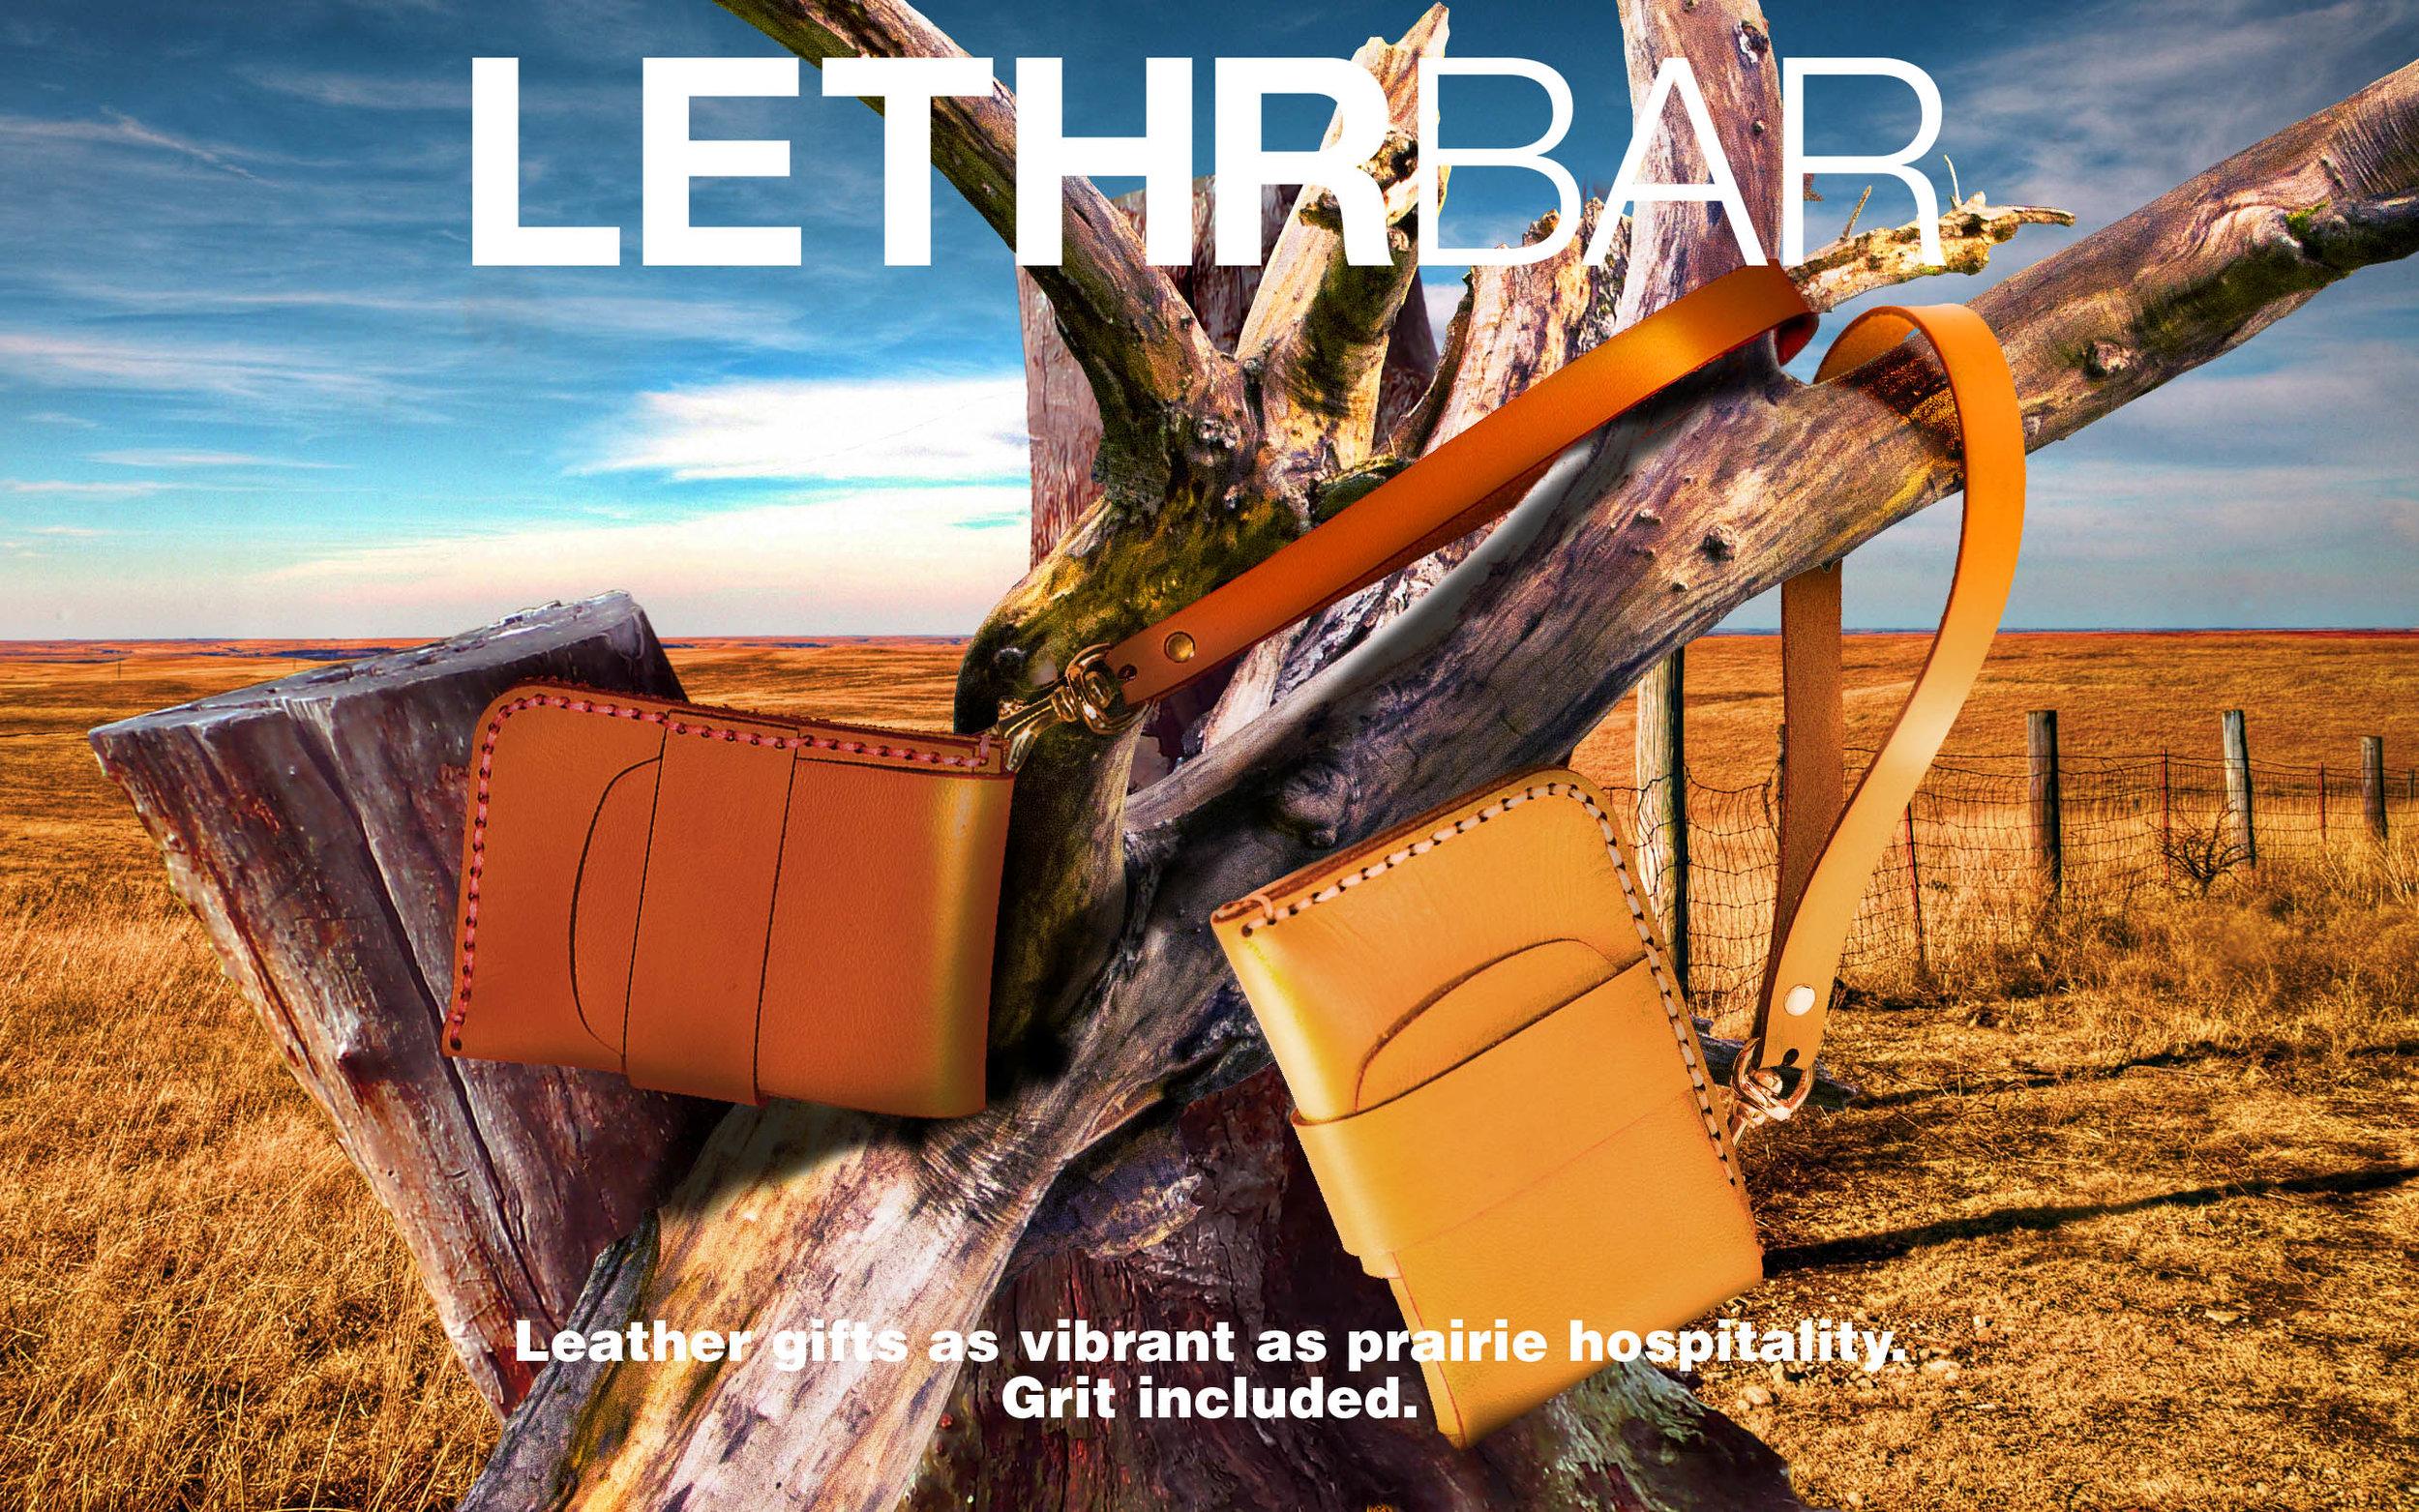 LETHRBAR.6.jpg